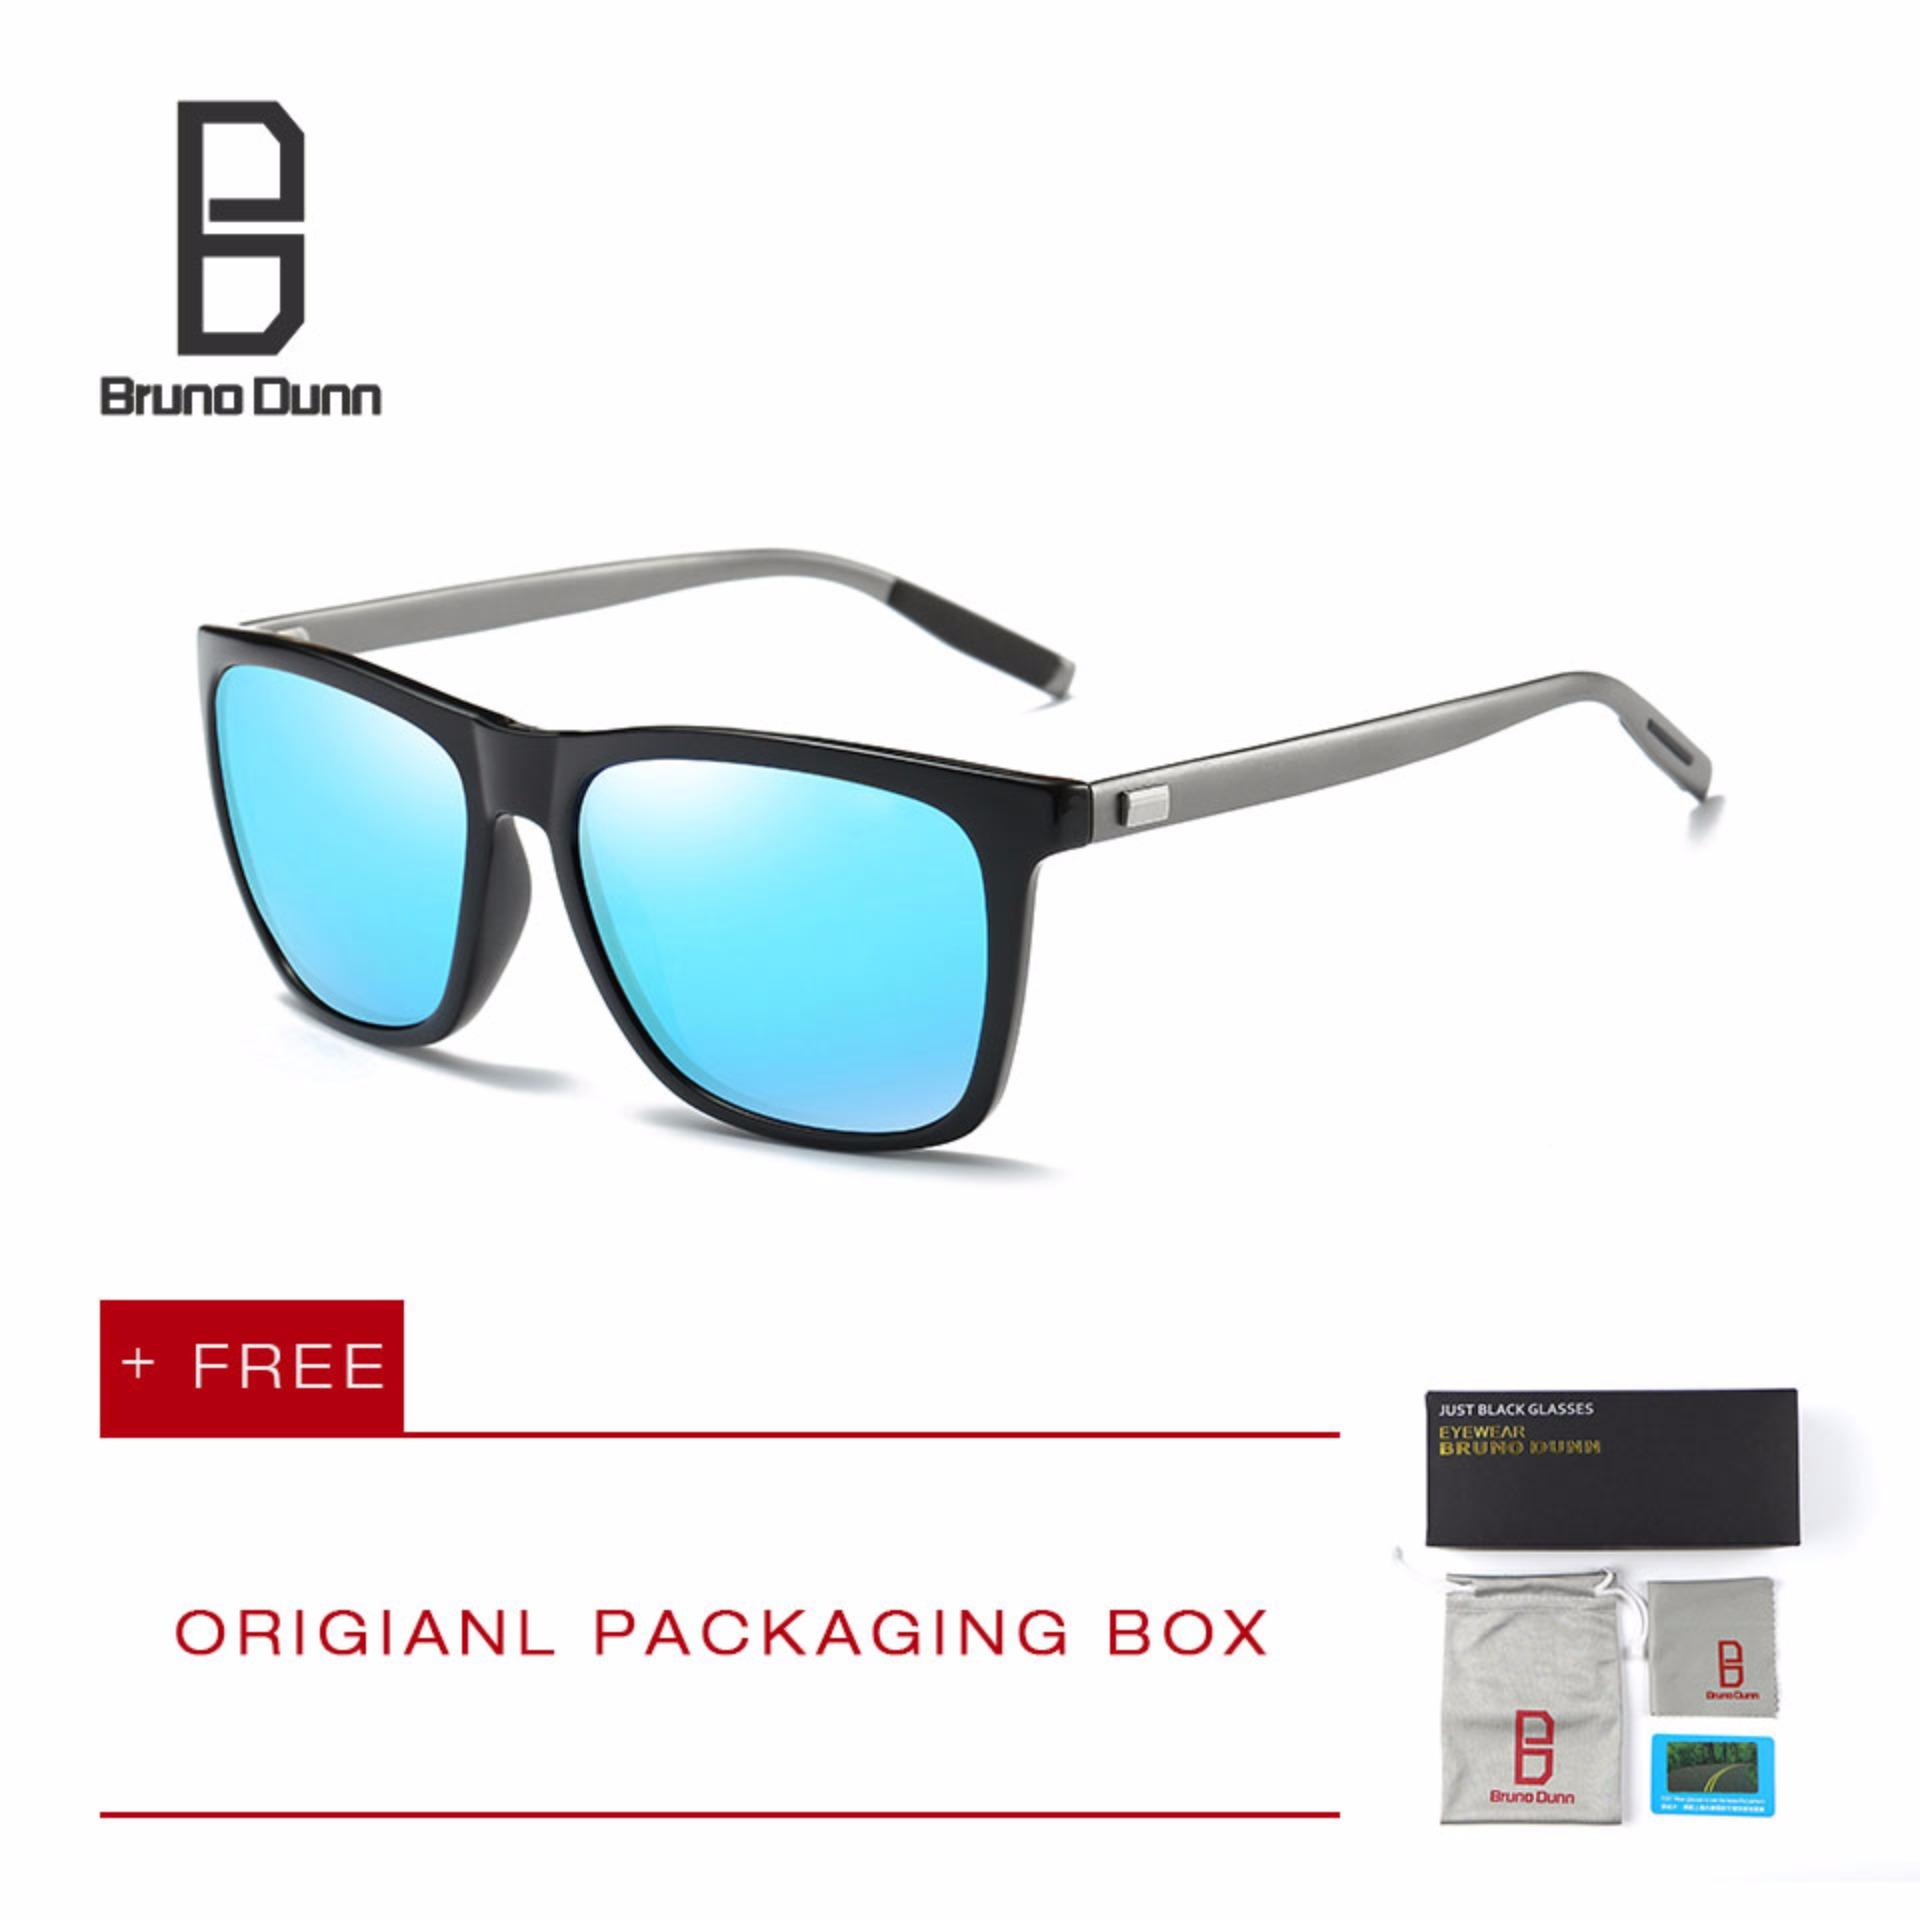 ... Hitam Wanita Fashion Pria Berjemur Kacamata Vintage. Source ... Bruno  Dunn Brand 2017 Fashion baru buatan manusia bingkai bulat besar kacamata ... ee1c289ca7